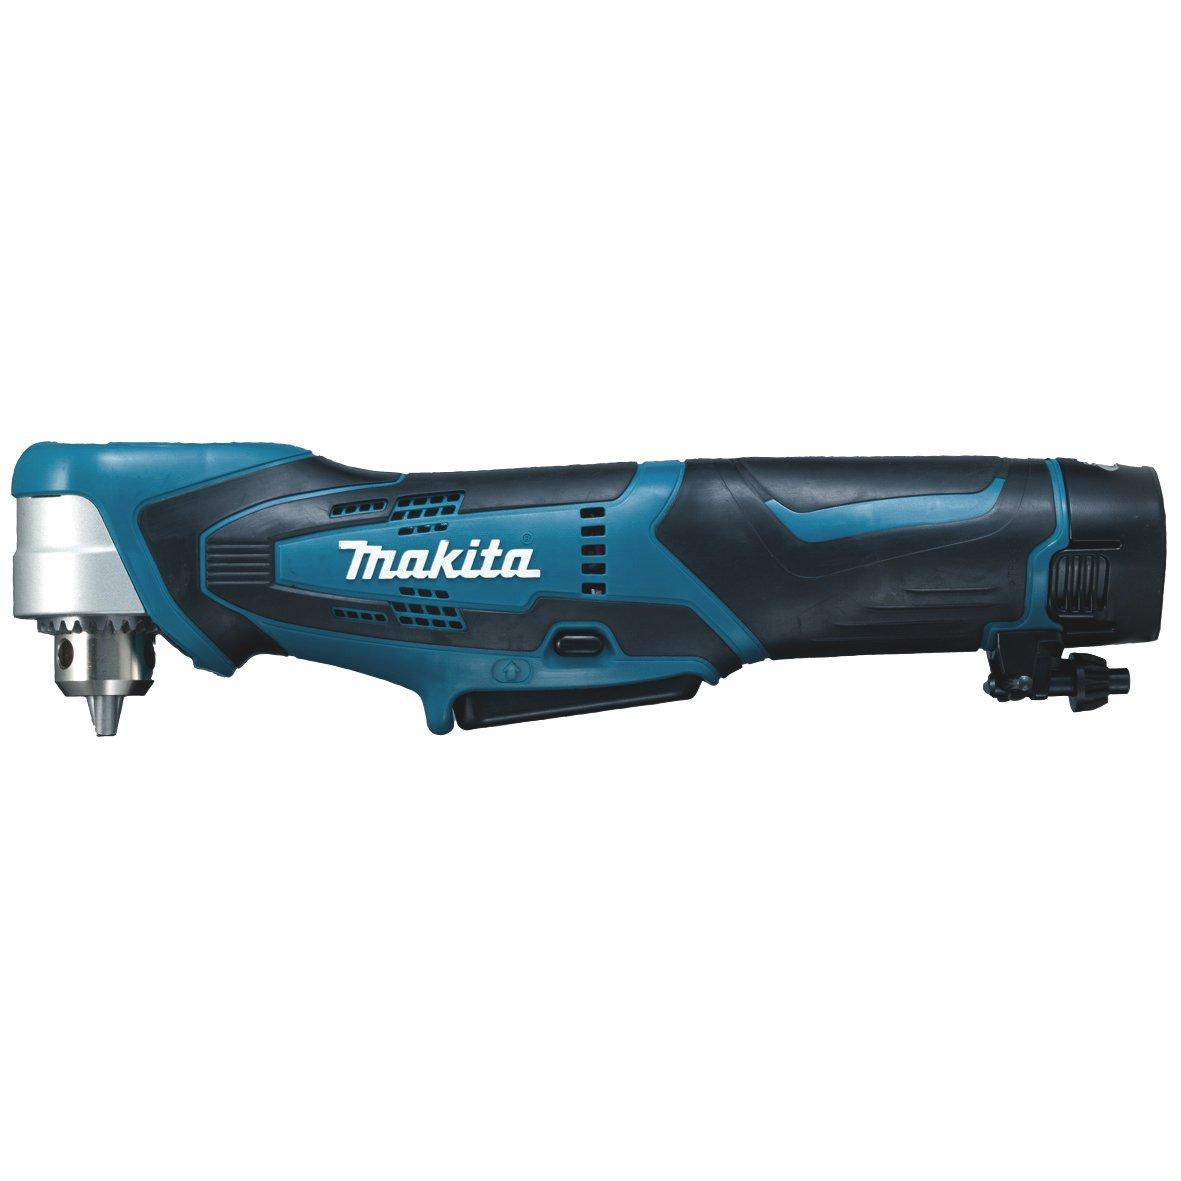 Makita-DA330DWE-Akku-Winkelbohrmaschine-108-V